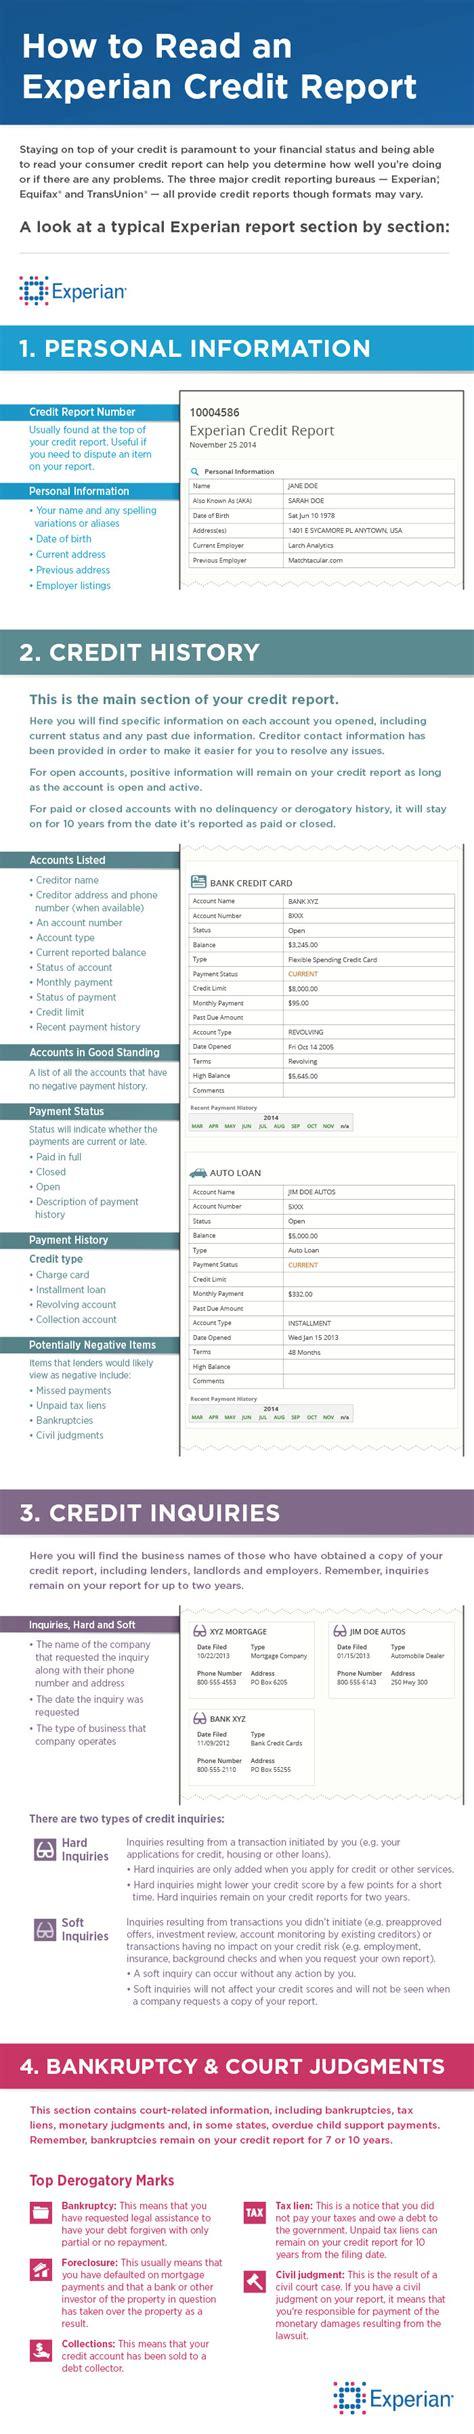 credit bureau experian experian credit report 2 car insurance cover hurricane